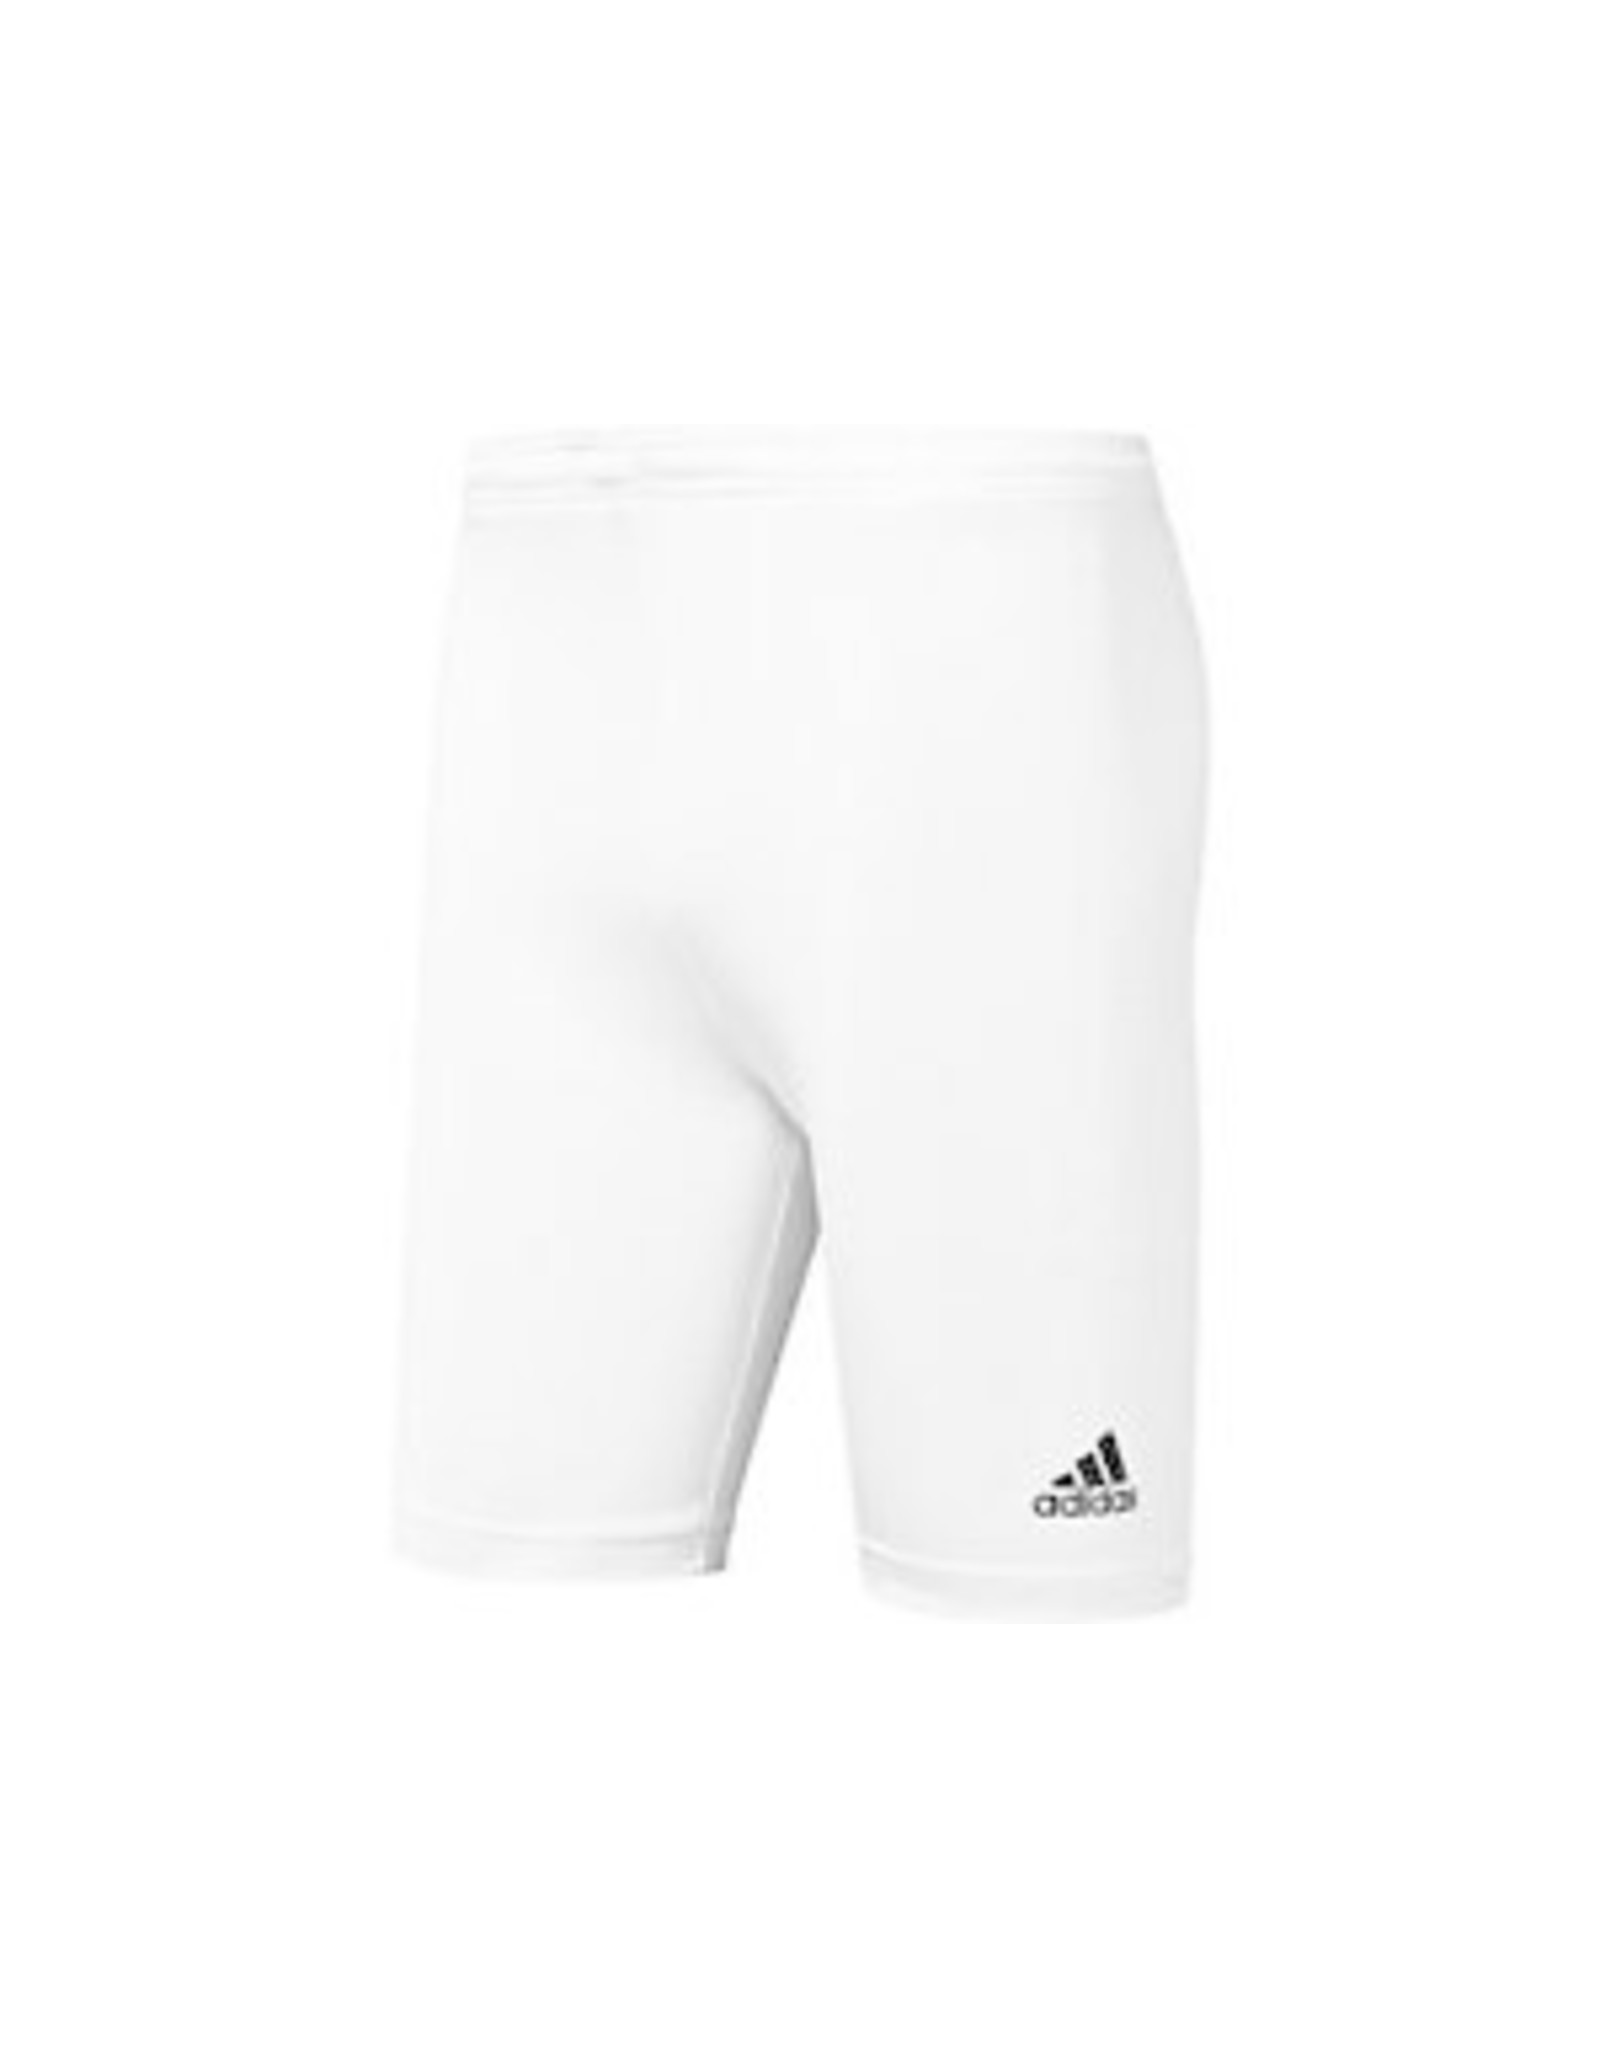 Umbro Adidas Men's Samba Tights (White/Black)